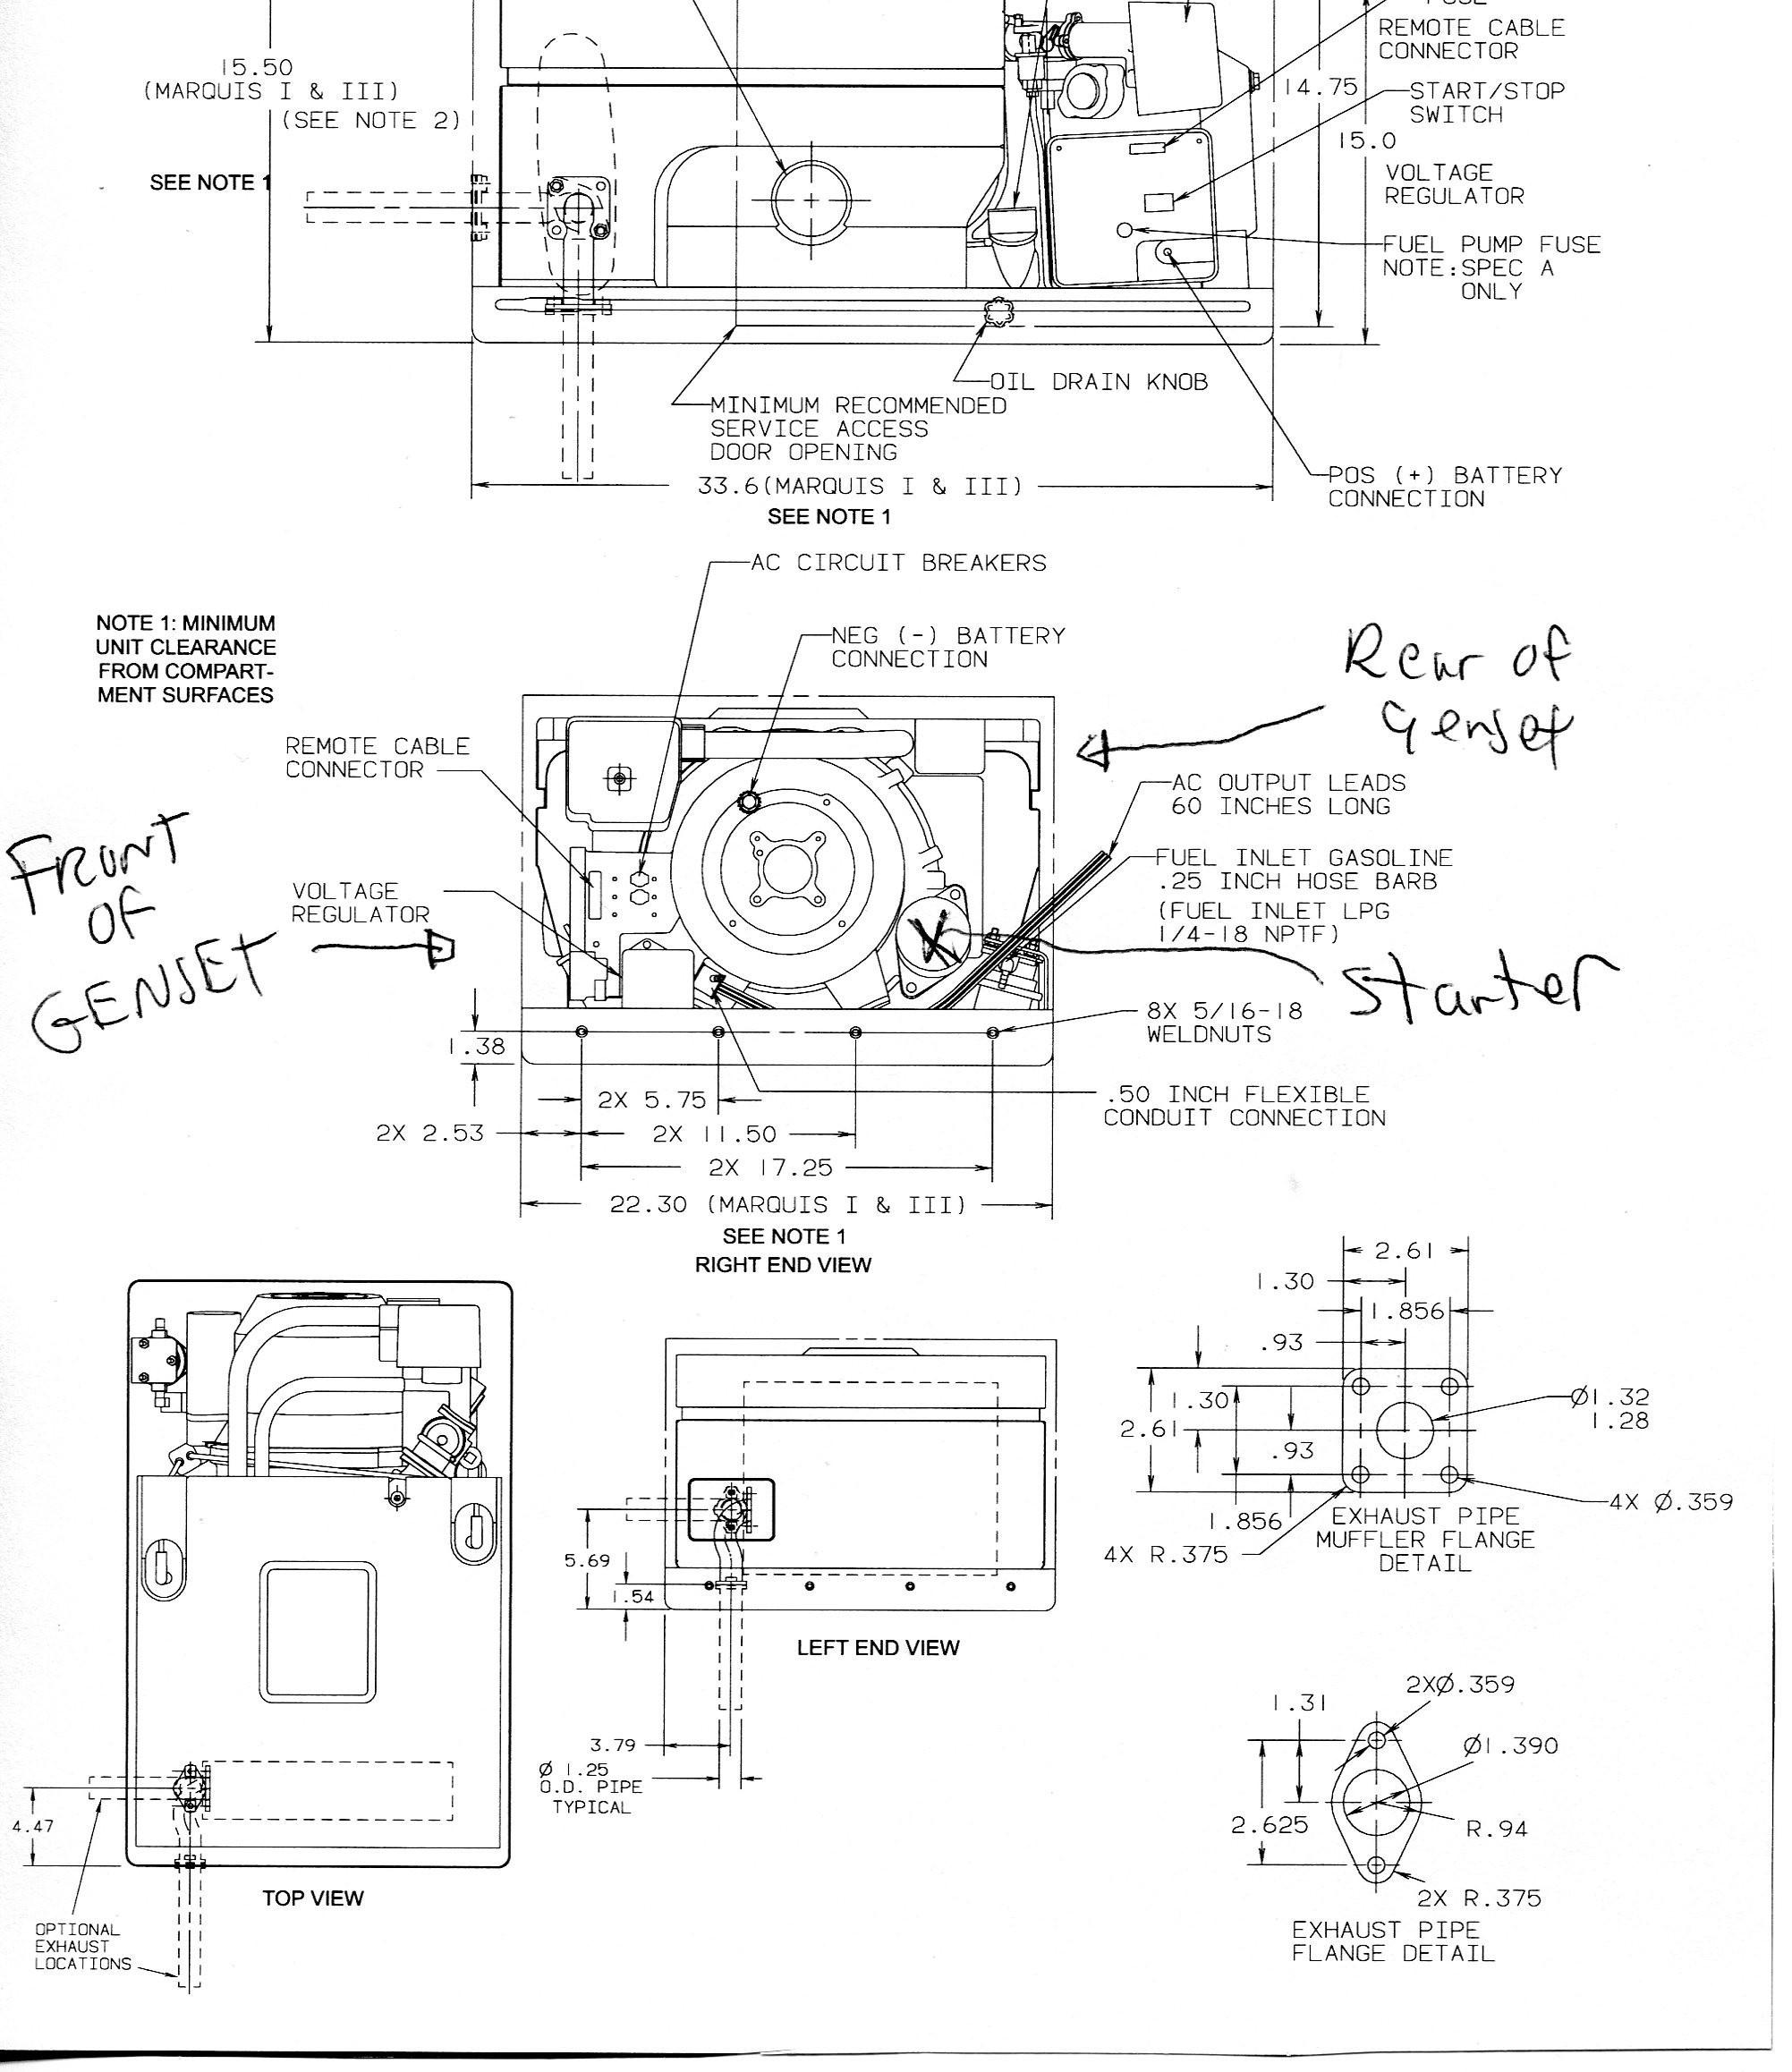 Passtime Gps Wiring Diagram Wiring Diagram for An Rv Generator Inspirational 4000 Rv Generator Of Passtime Gps Wiring Diagram